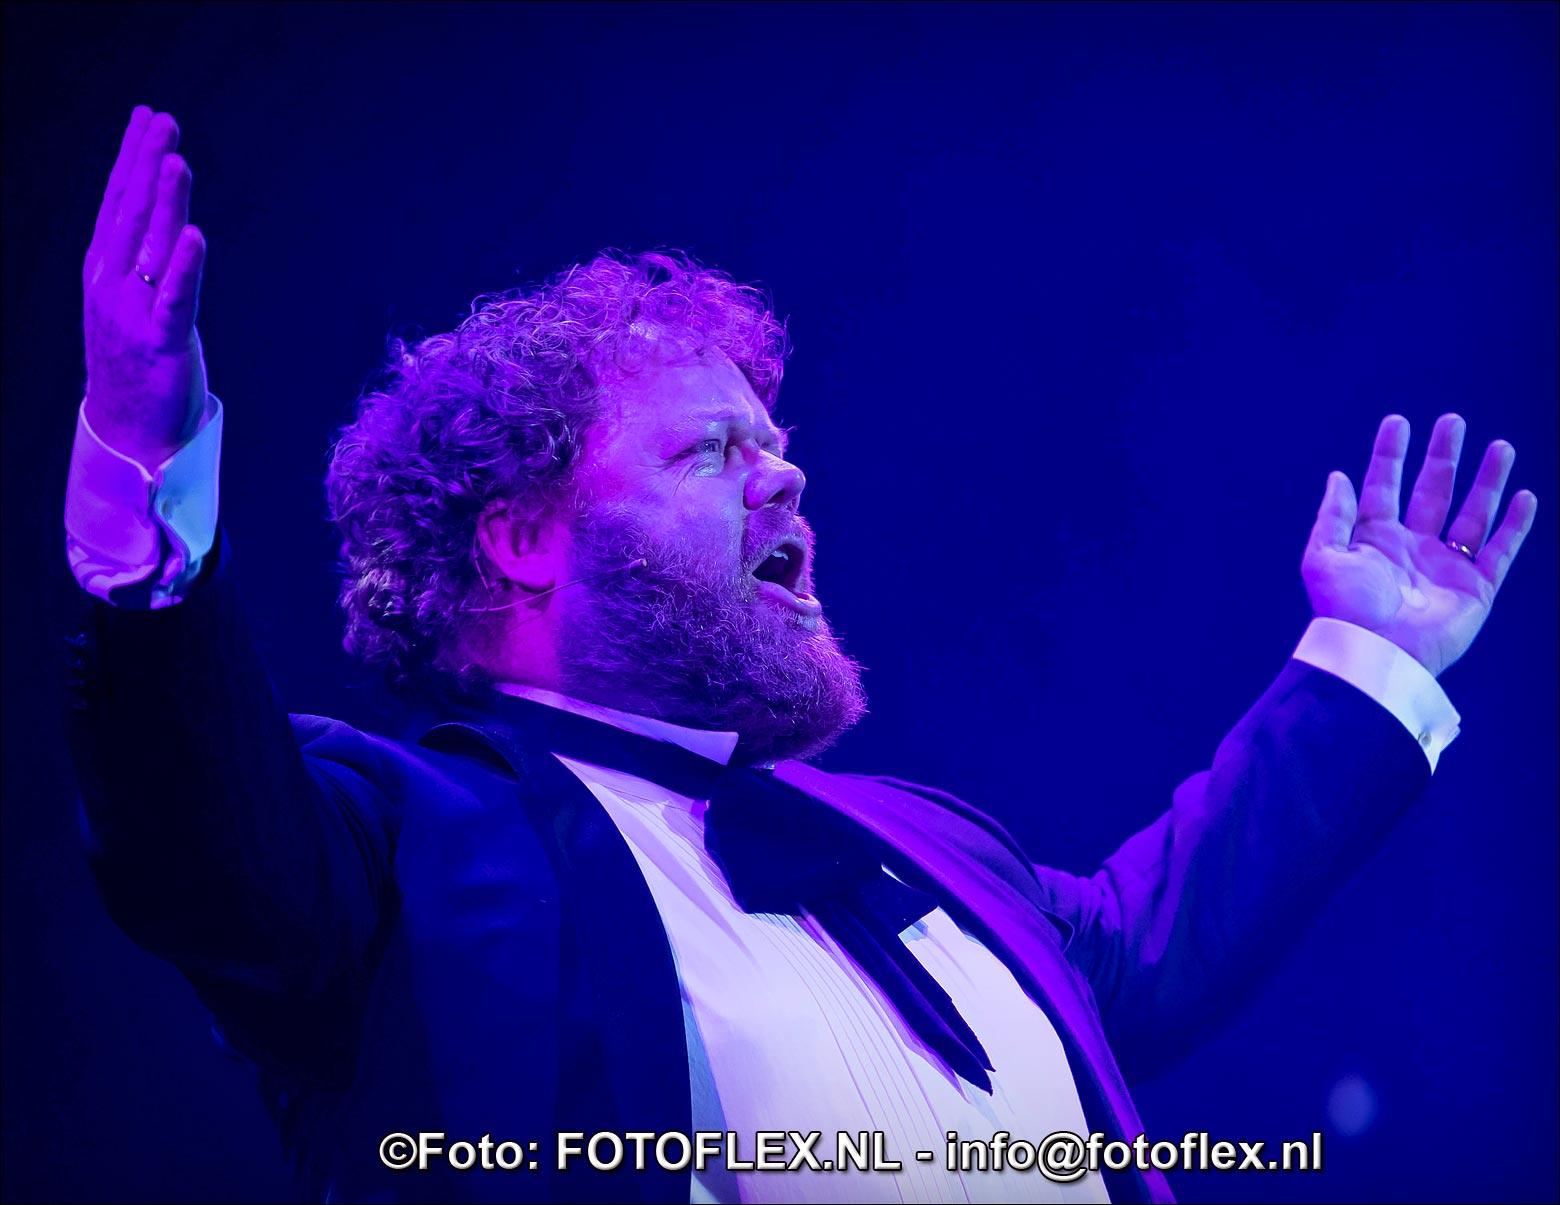 0590-CopyrightFOTOFLEX.NL07012020